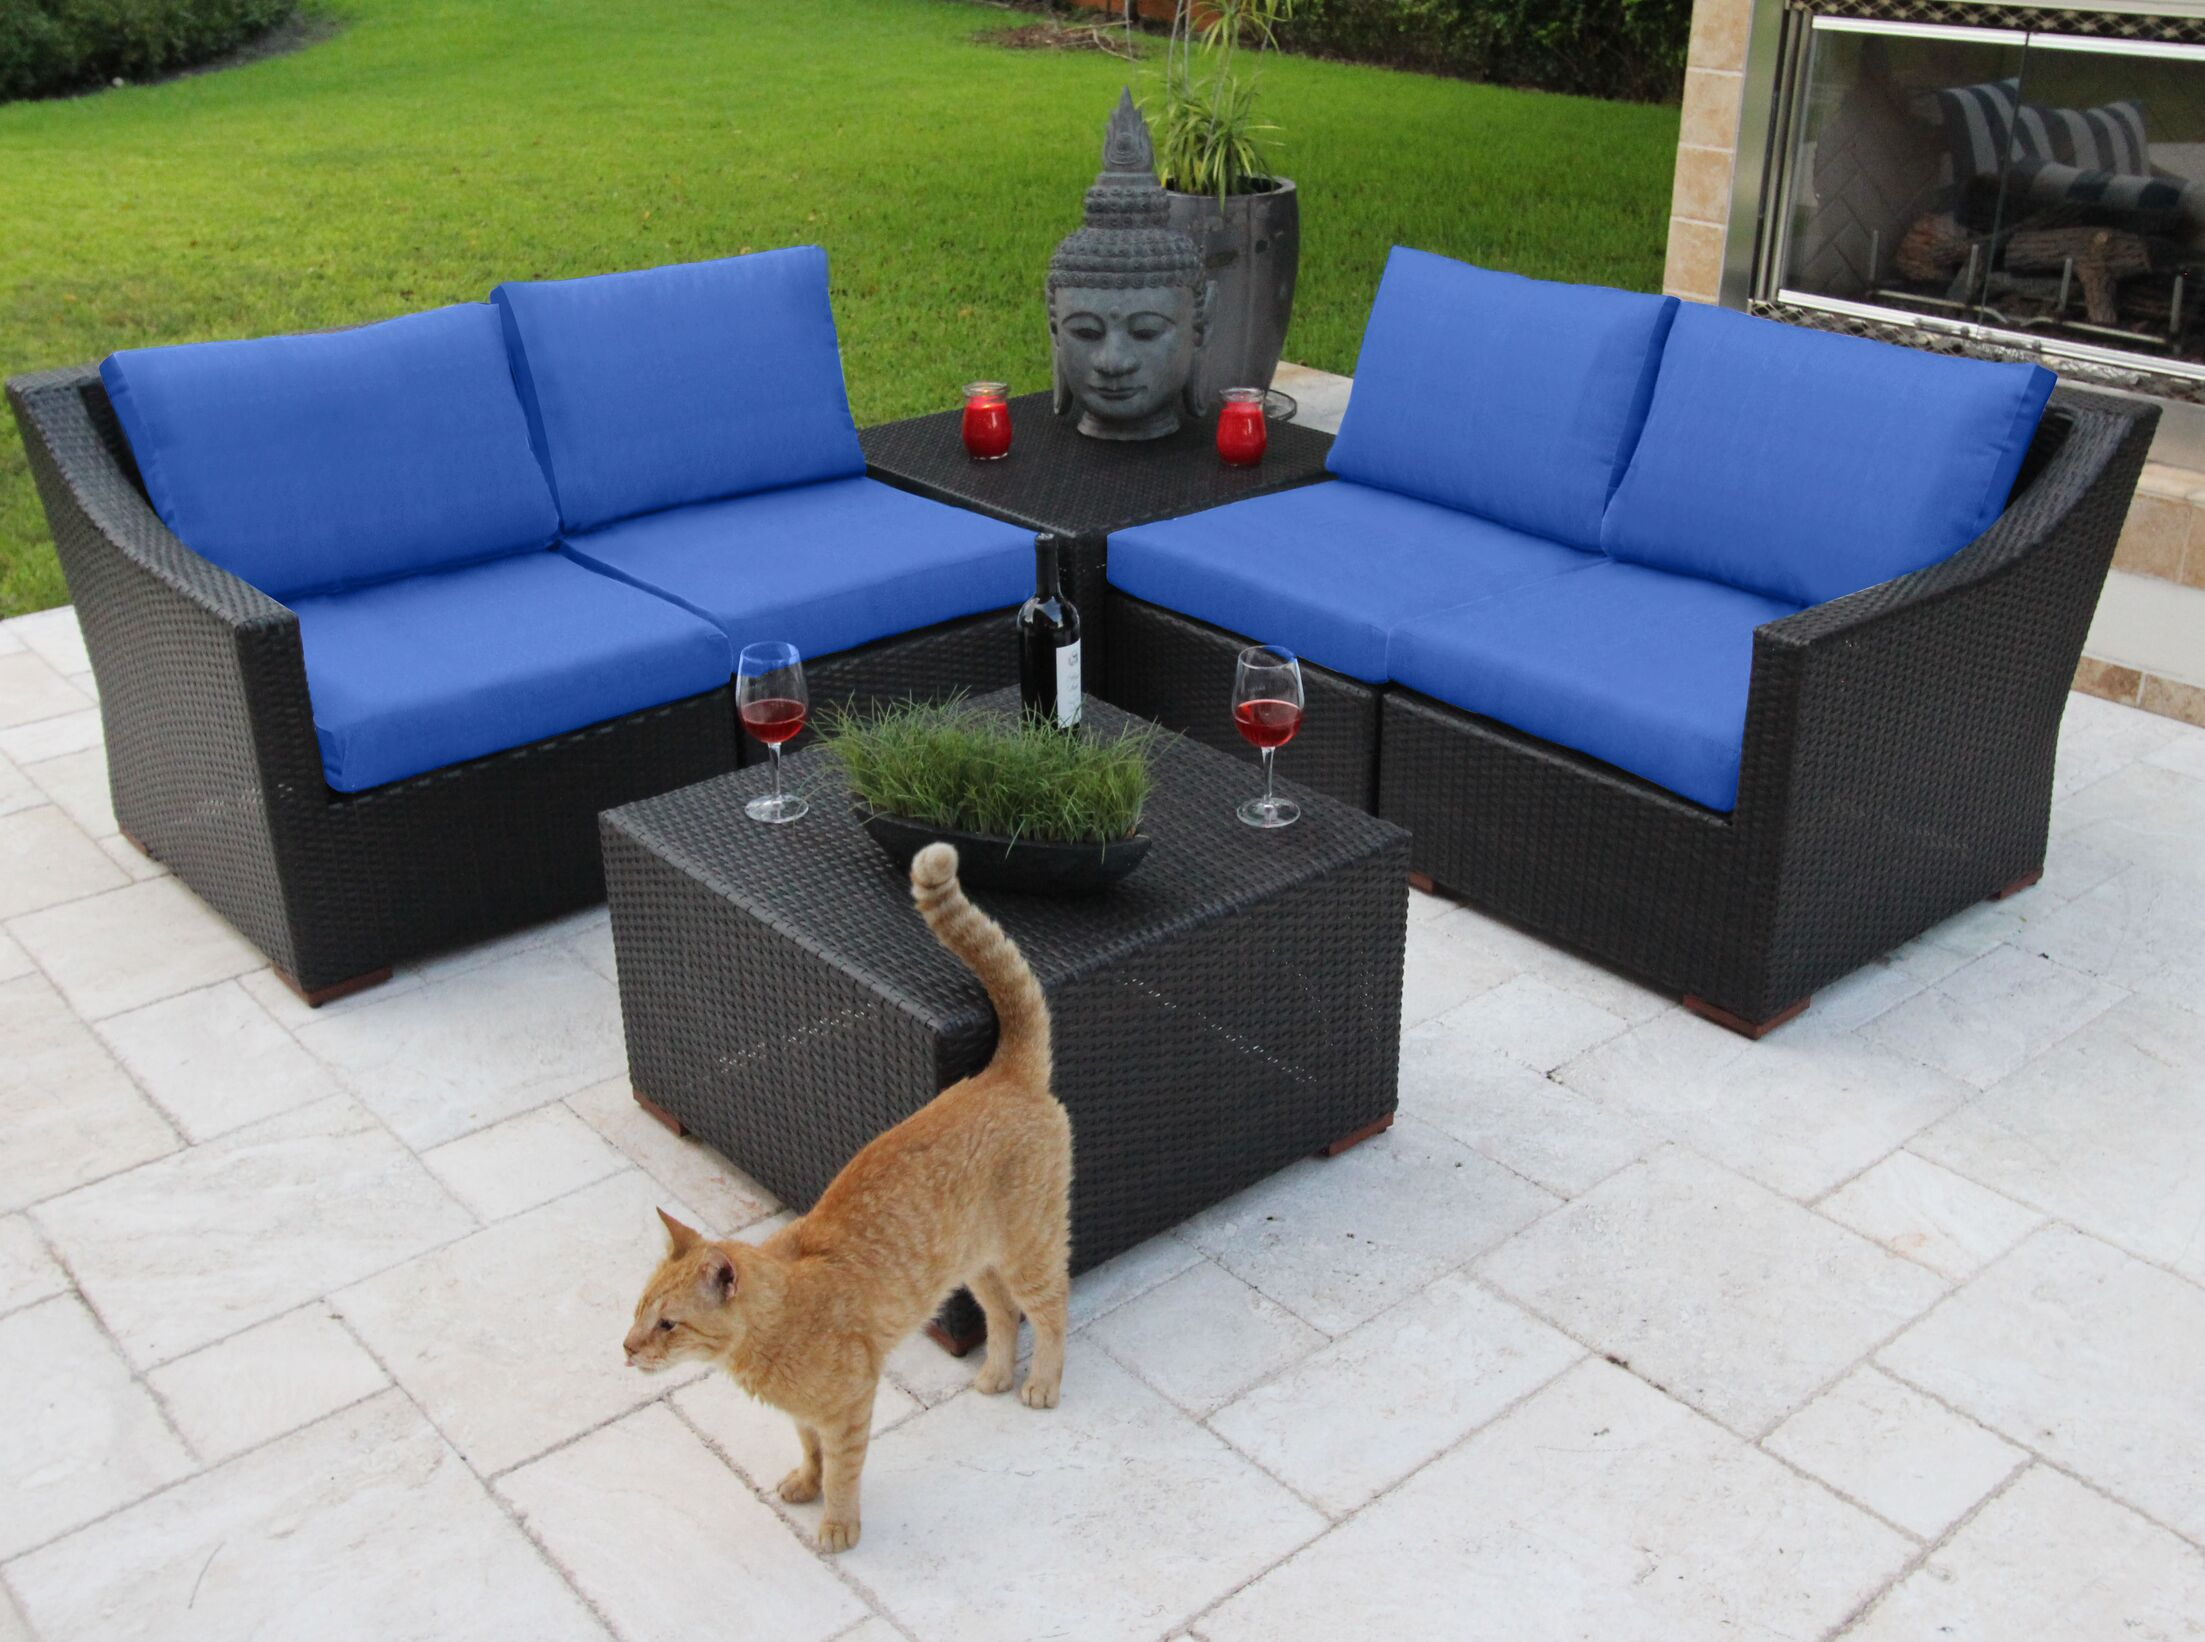 Marcelo 6 Piece Sunbrella Sofa Set with Cushions Fabric: Blue - Canvas True Blue